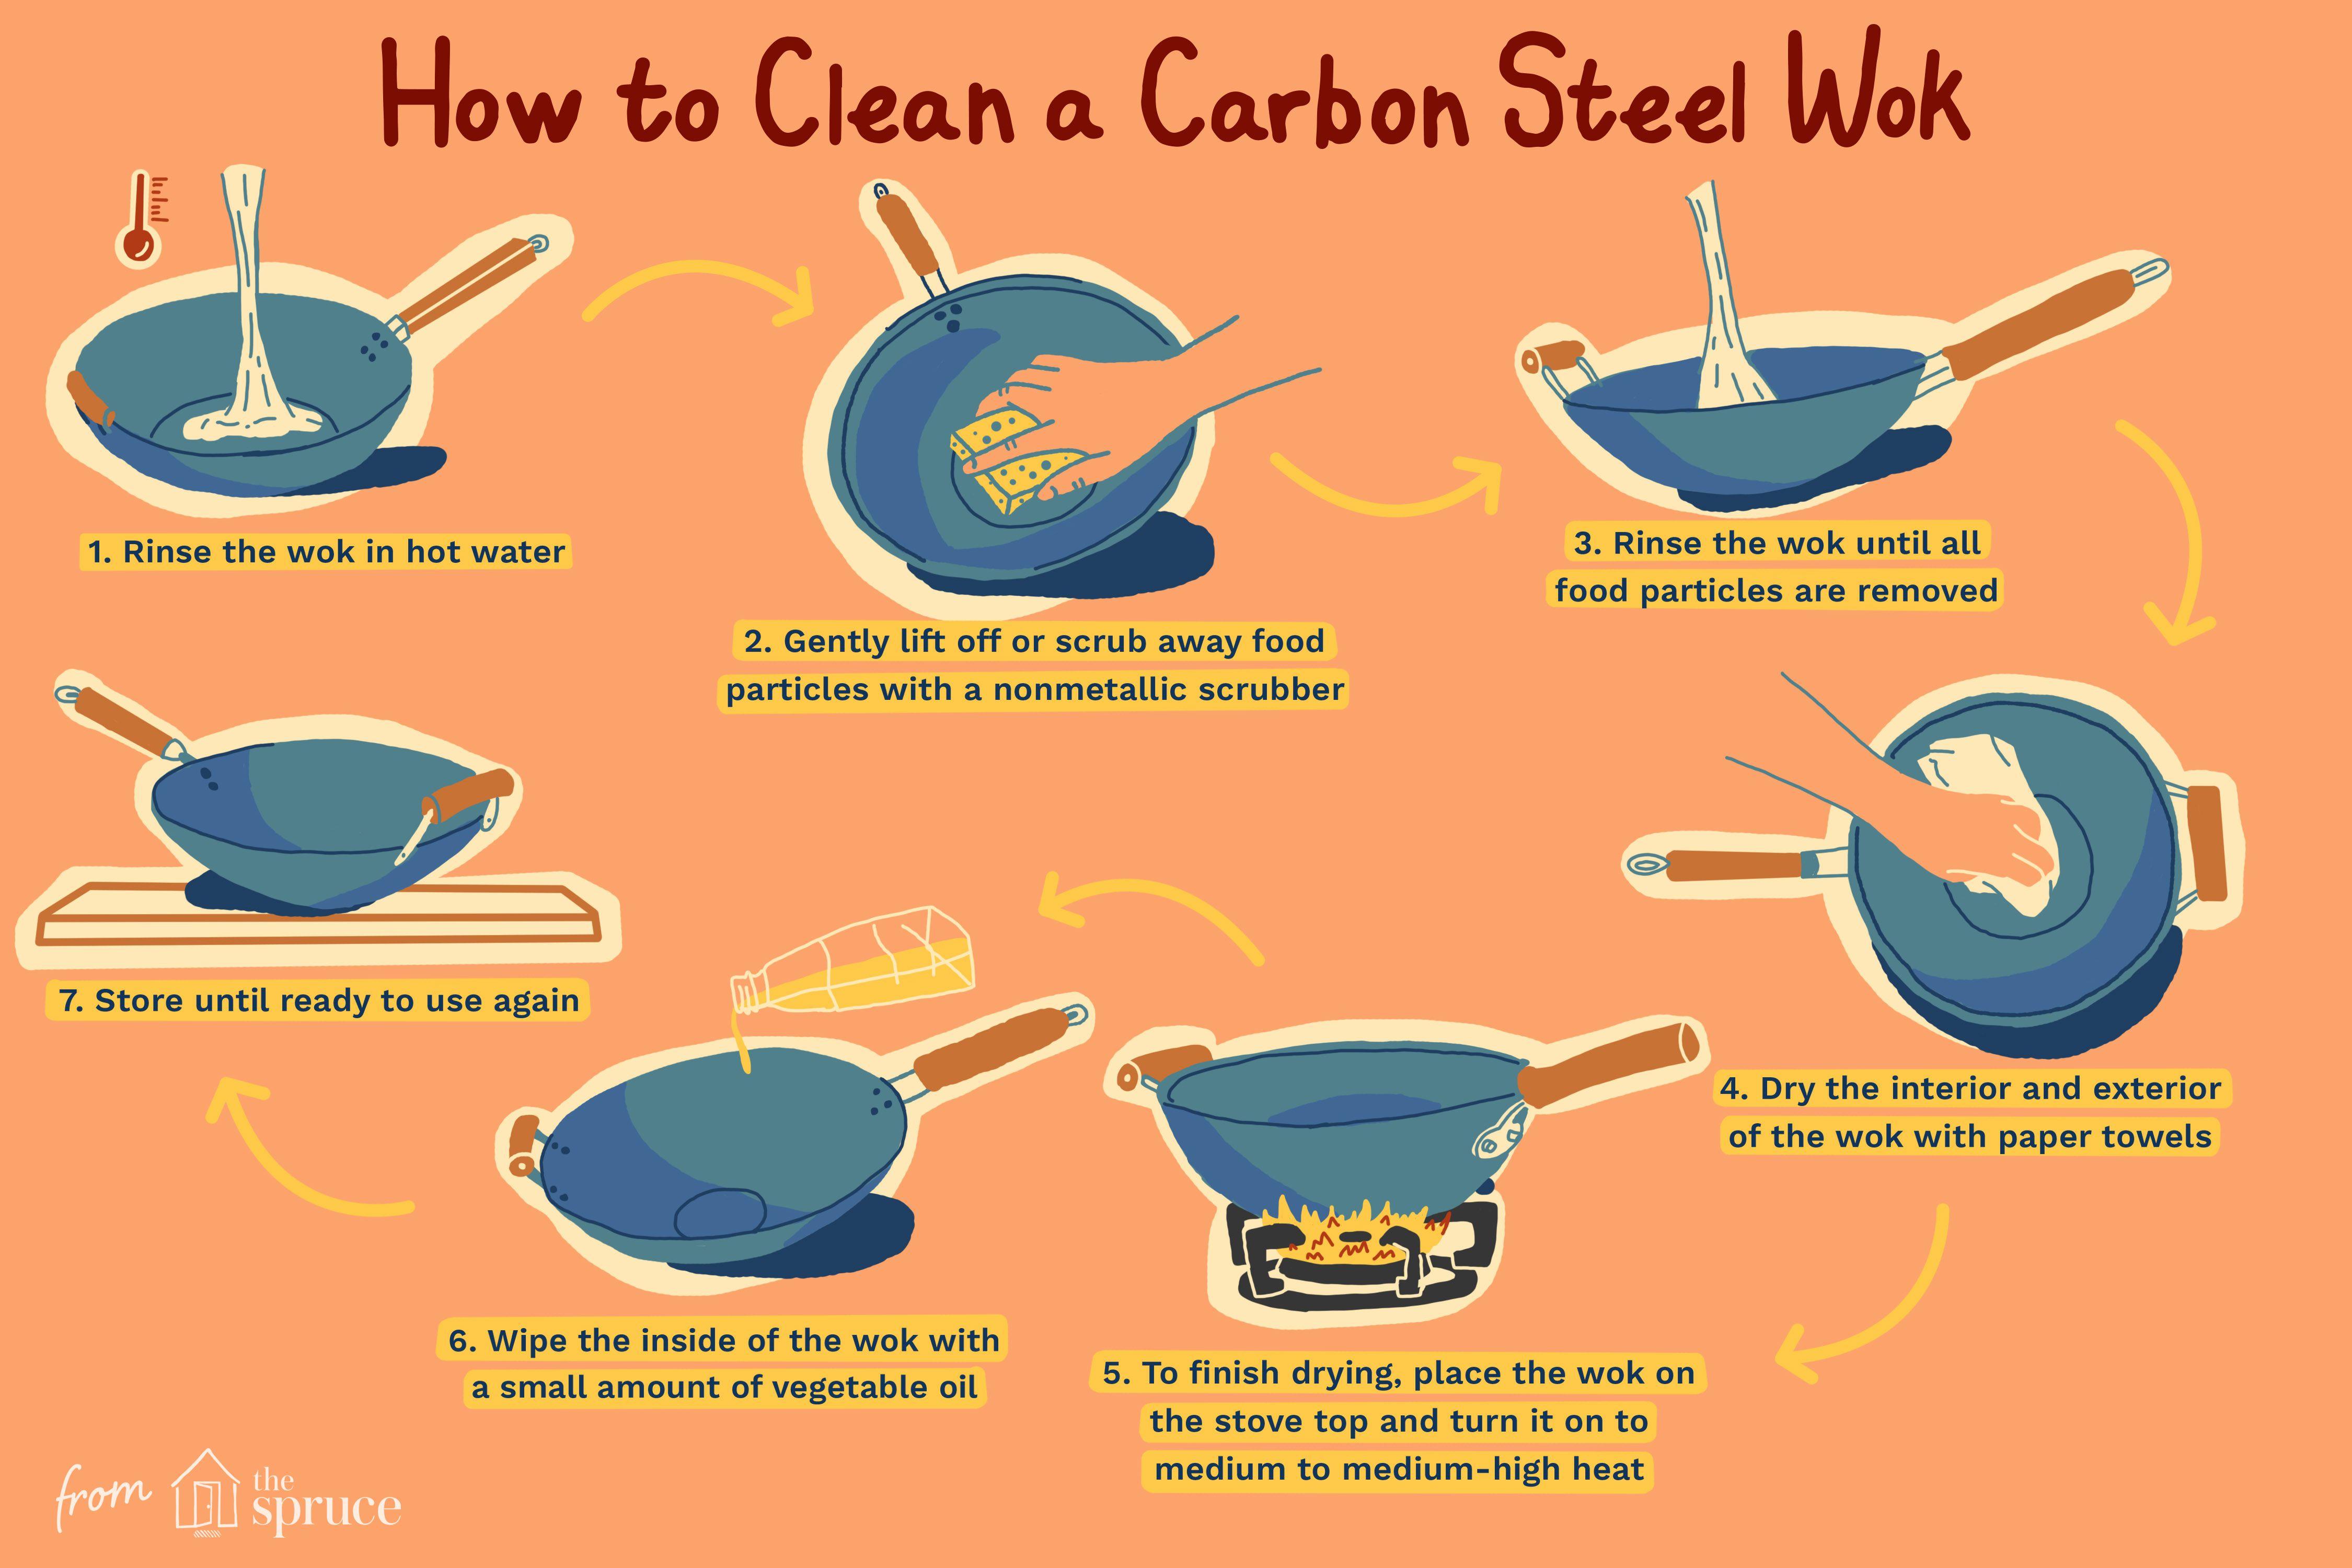 clean a carbon steel wok illustration